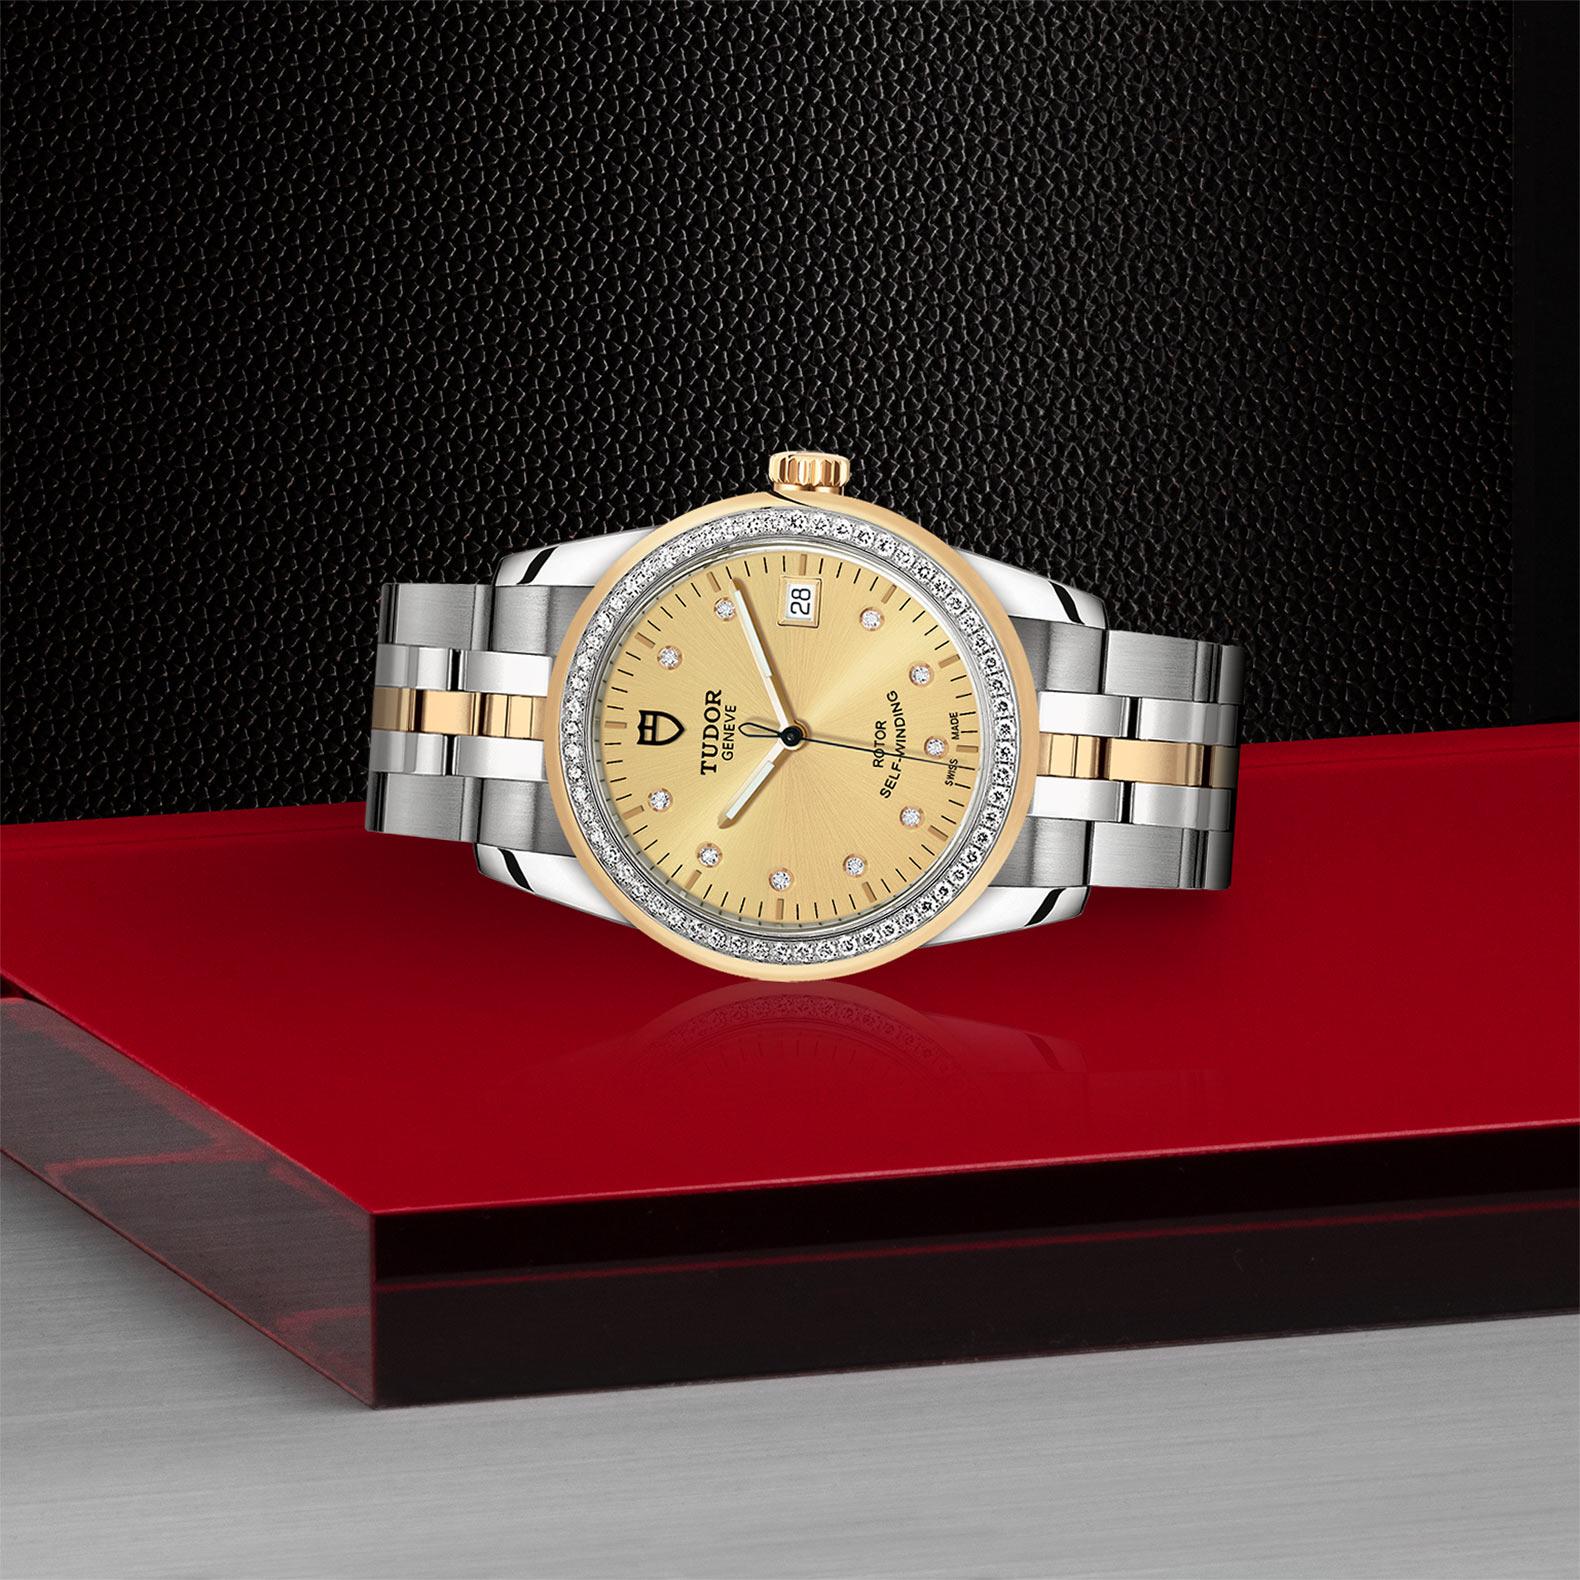 TUDOR Glamour Date - M55023-0026